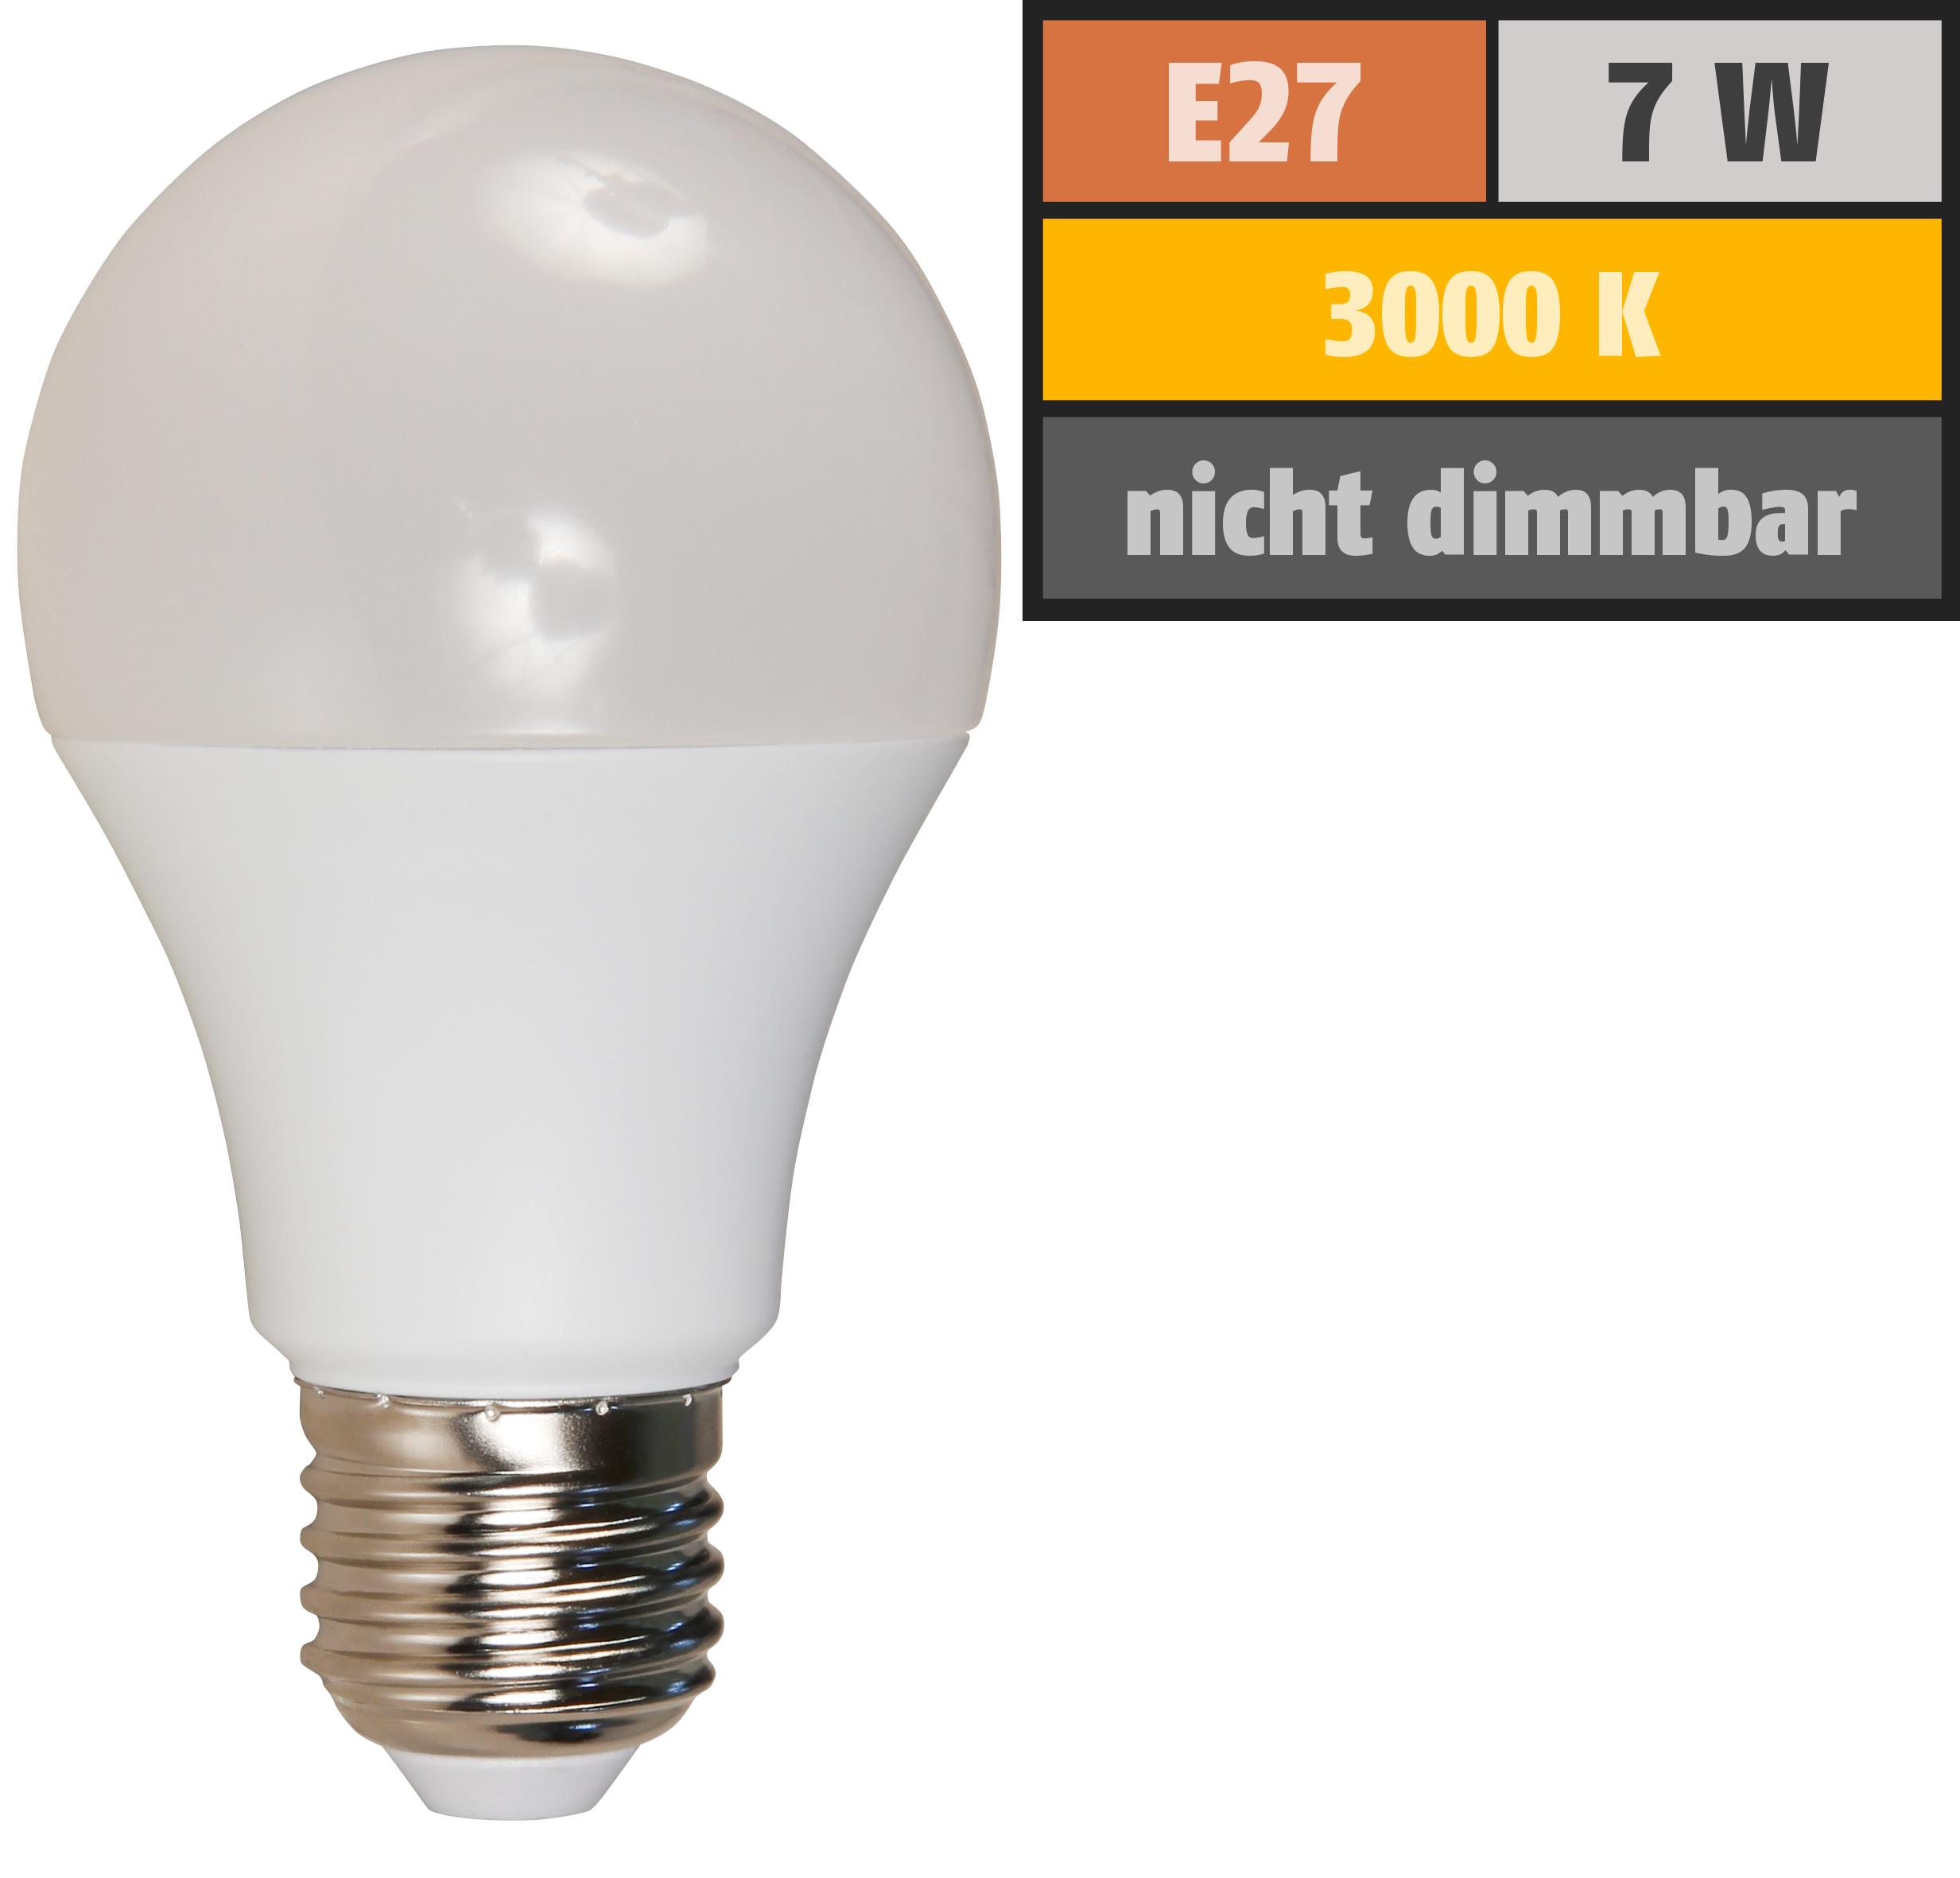 "110 lm LED-Stiftsockellampe McShine /""Silicia COB/"" warmweiß 1W G4"